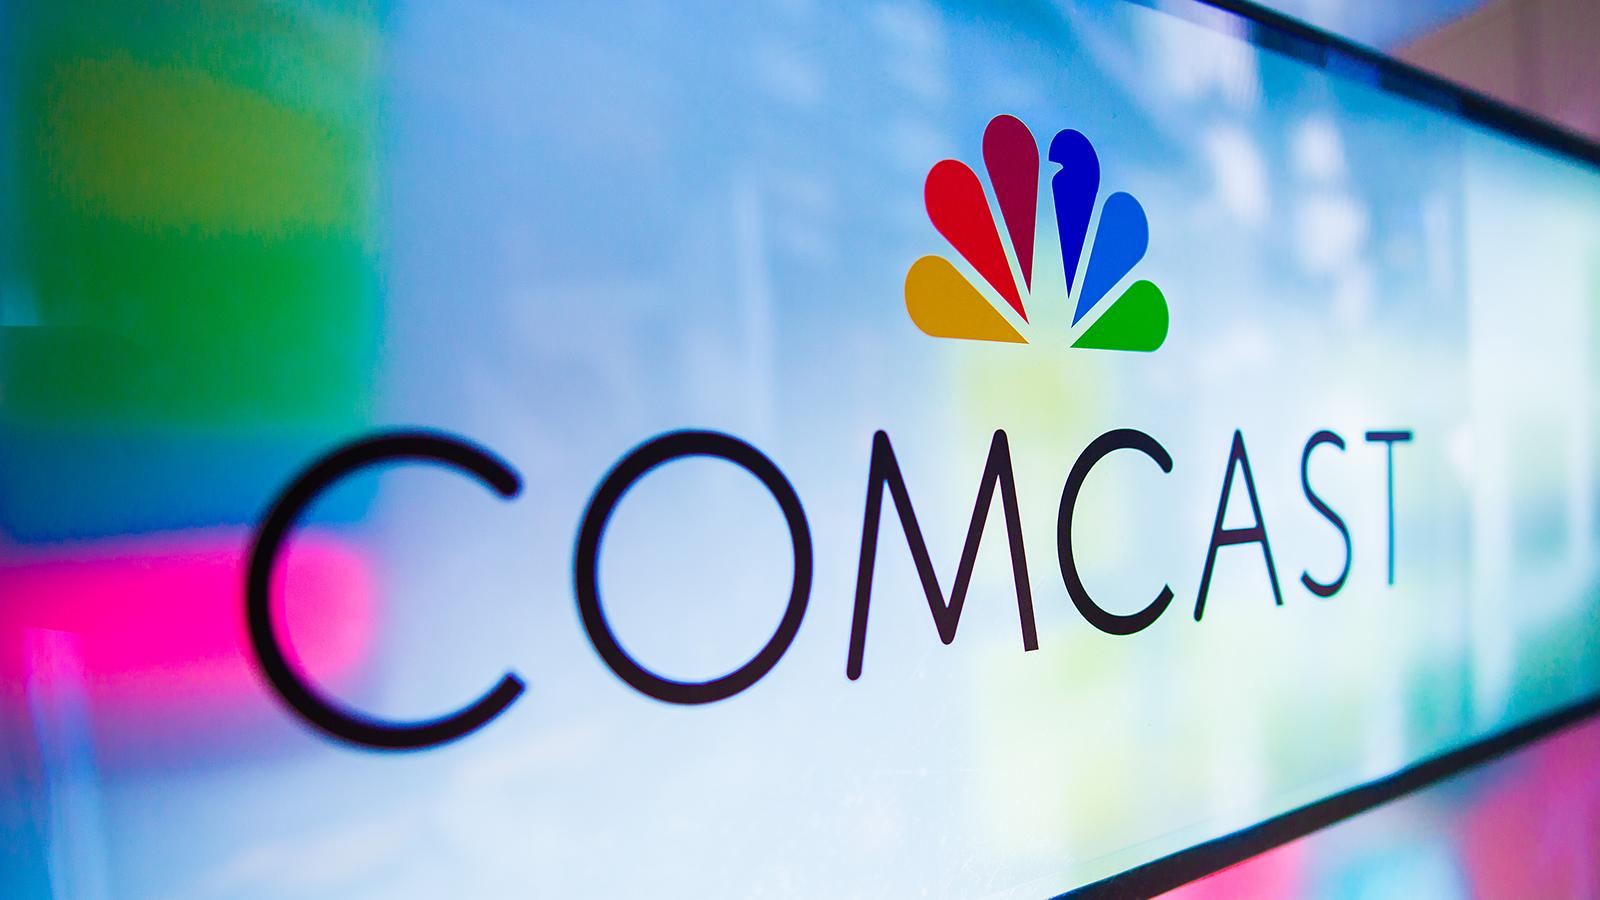 Comcast adds a dozen spanish language channels to xfinity latino in comcast adds a dozen spanish language channels to xfinity latino in washington state solutioingenieria Images